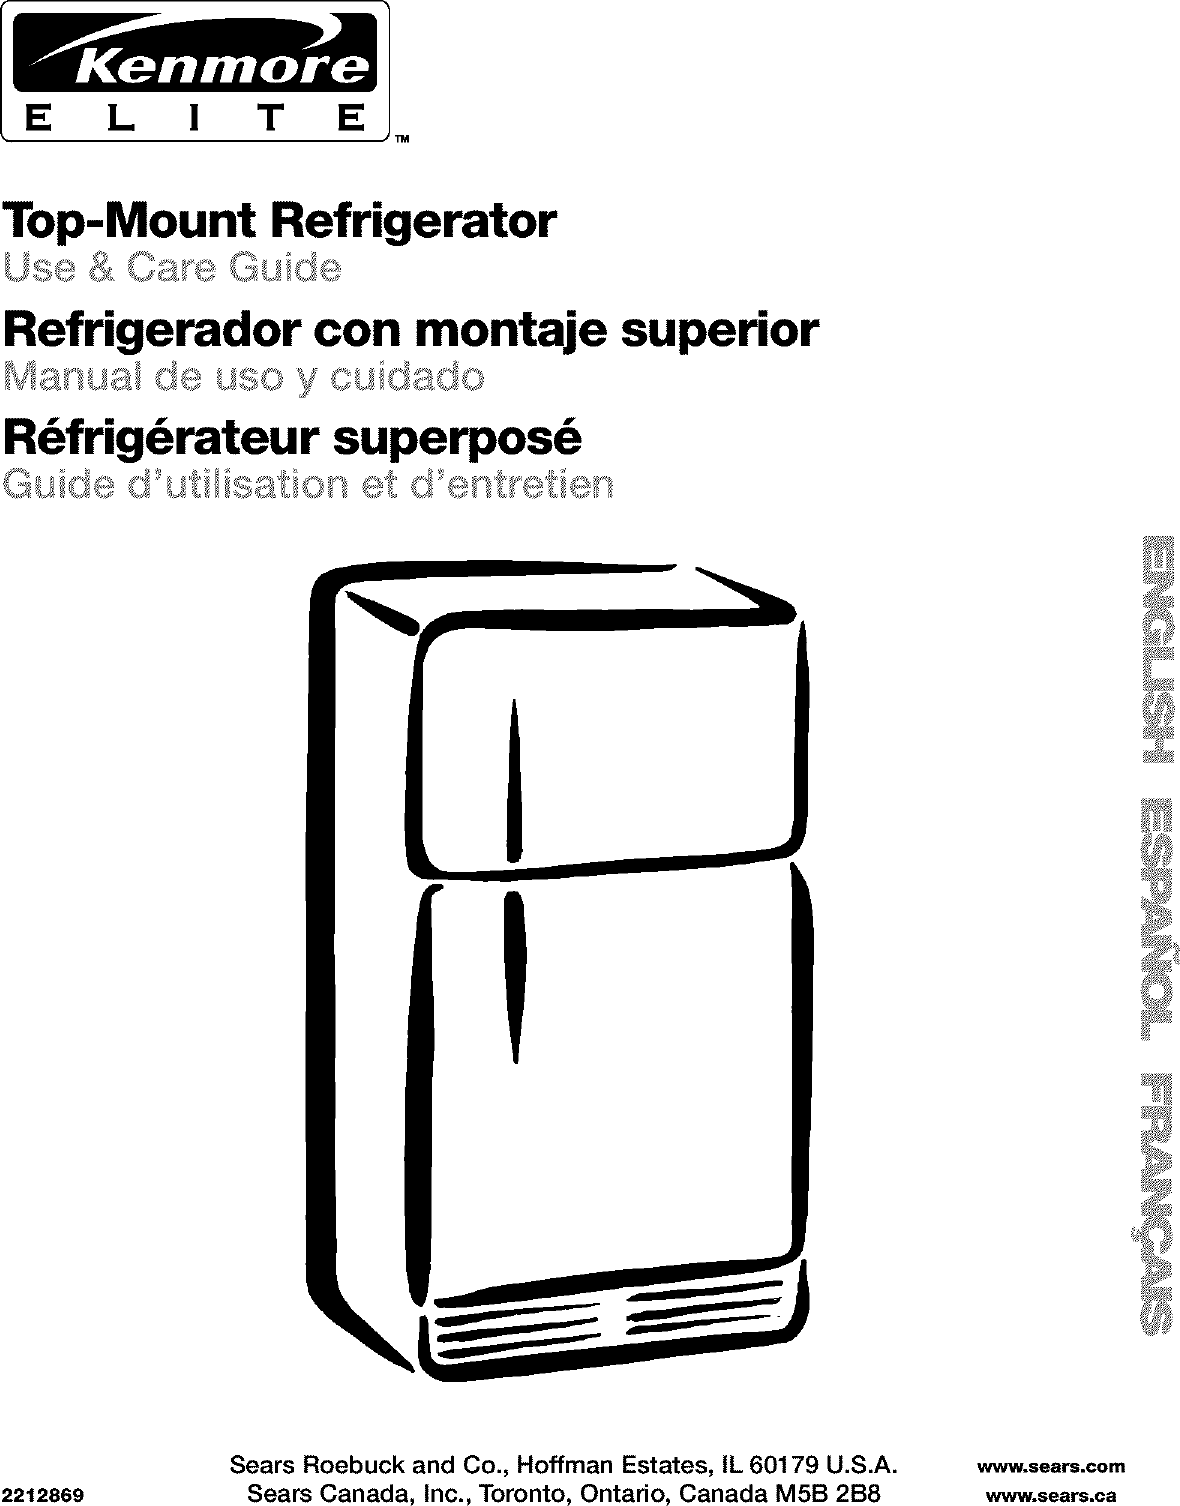 Kenmore 10671202100 User Manual TOP MOUNT REFRIGERATOR